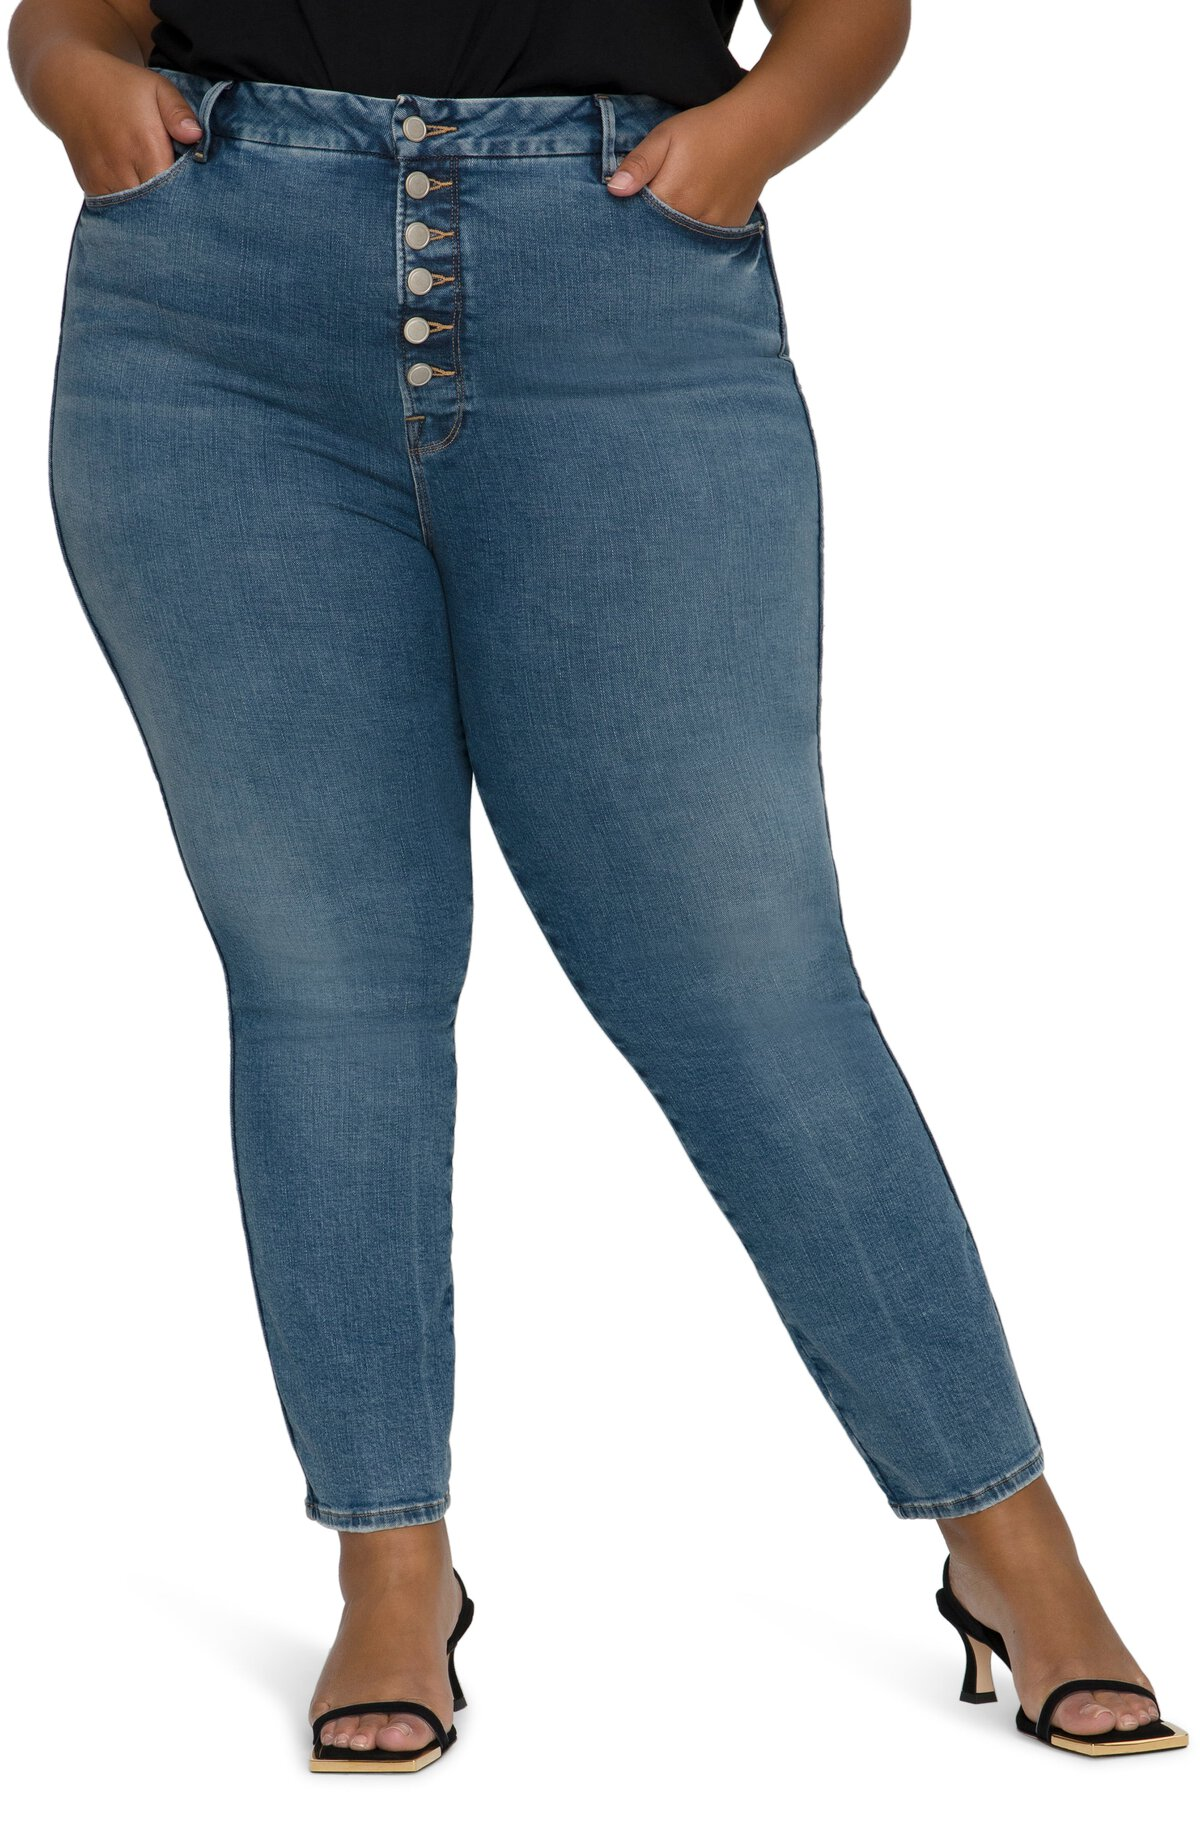 STYLECASTER | Best Jeans Long Torso Short Legs